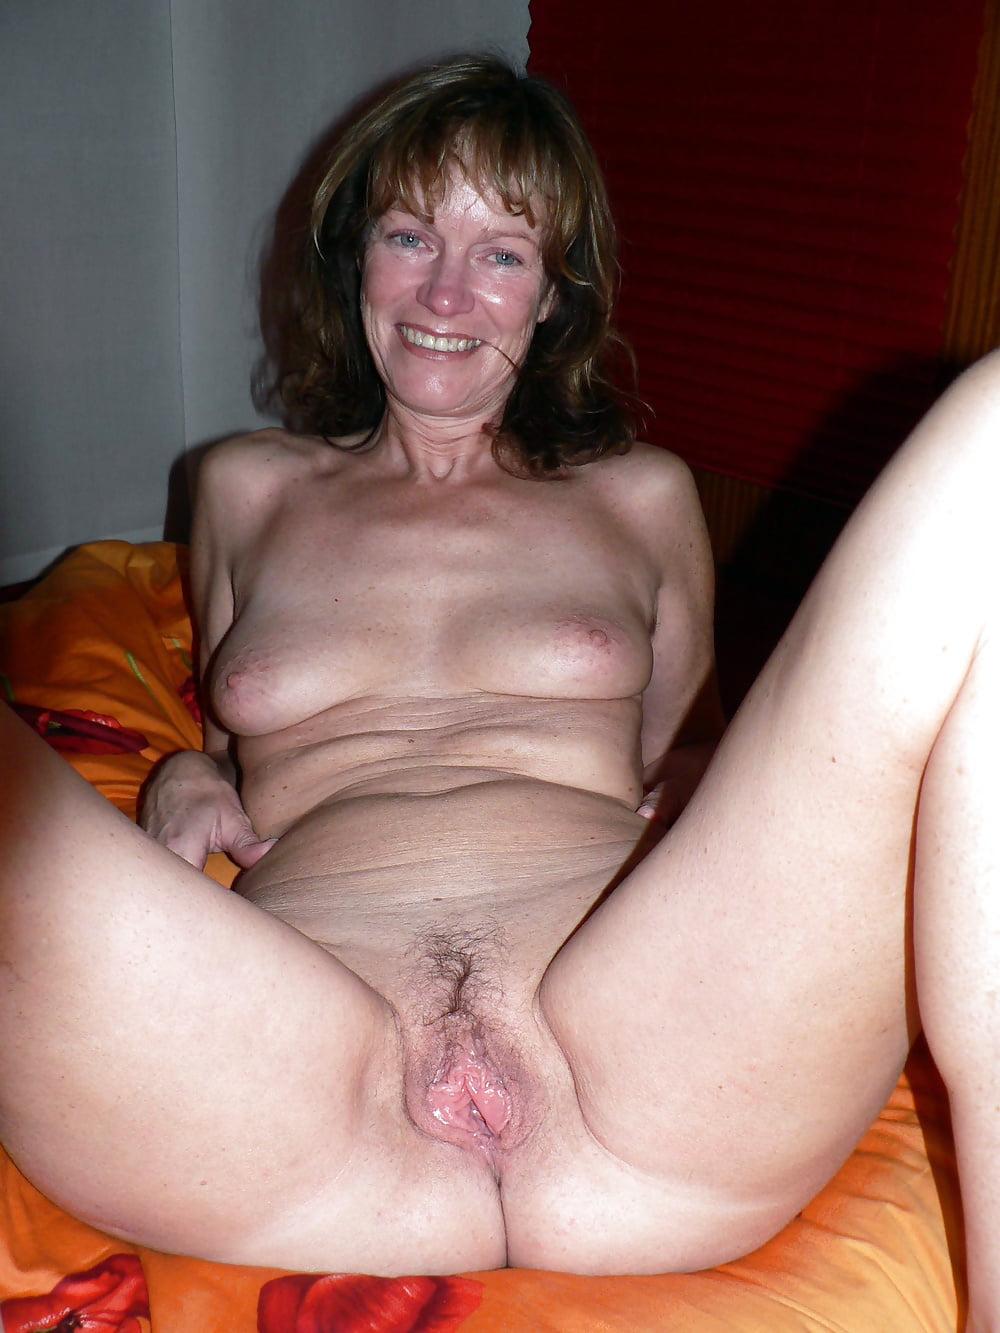 Carey girl amature porn pasco fl milf booty